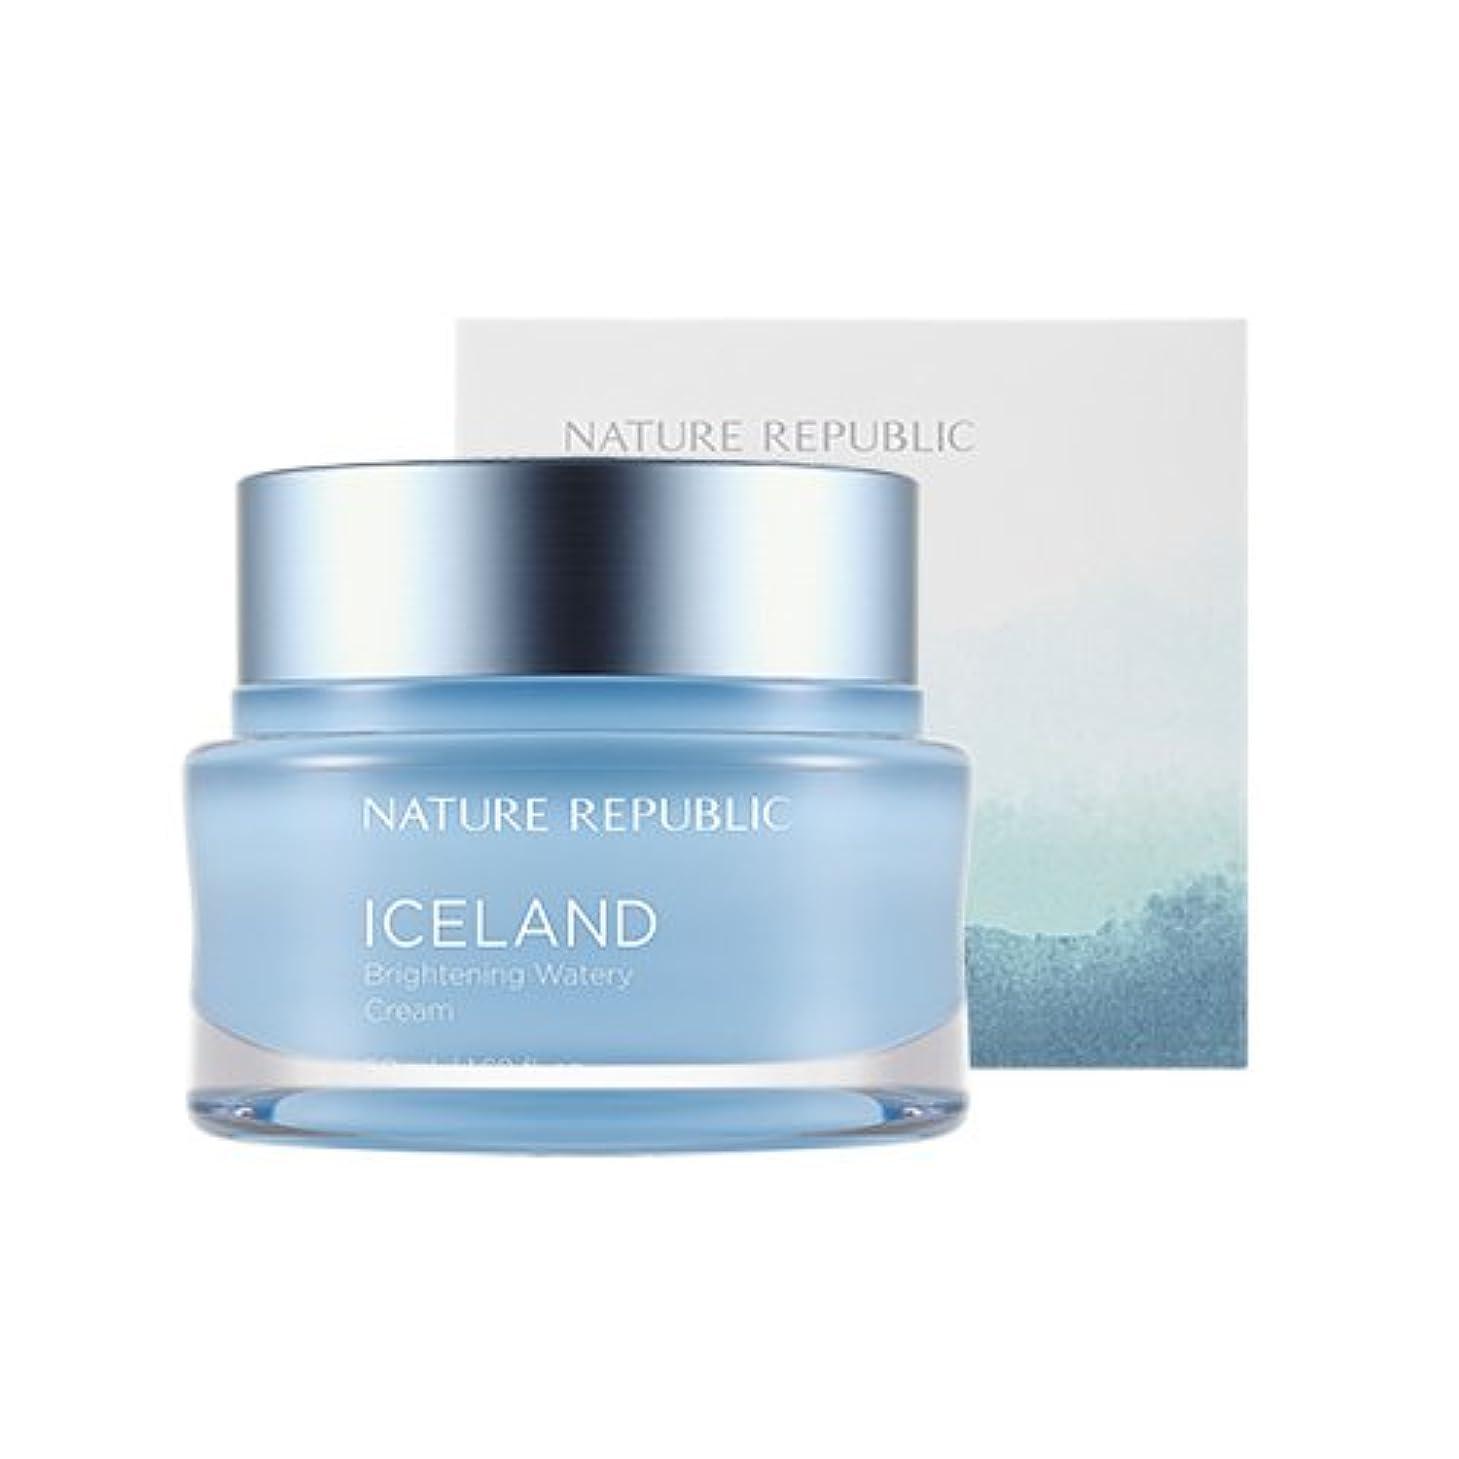 Nature Republic Iceland Brightening Watery Cream 50ml / ネイチャーリパブリック アイスランドランドブライトニング水分クリーム 50ml [並行輸入品]